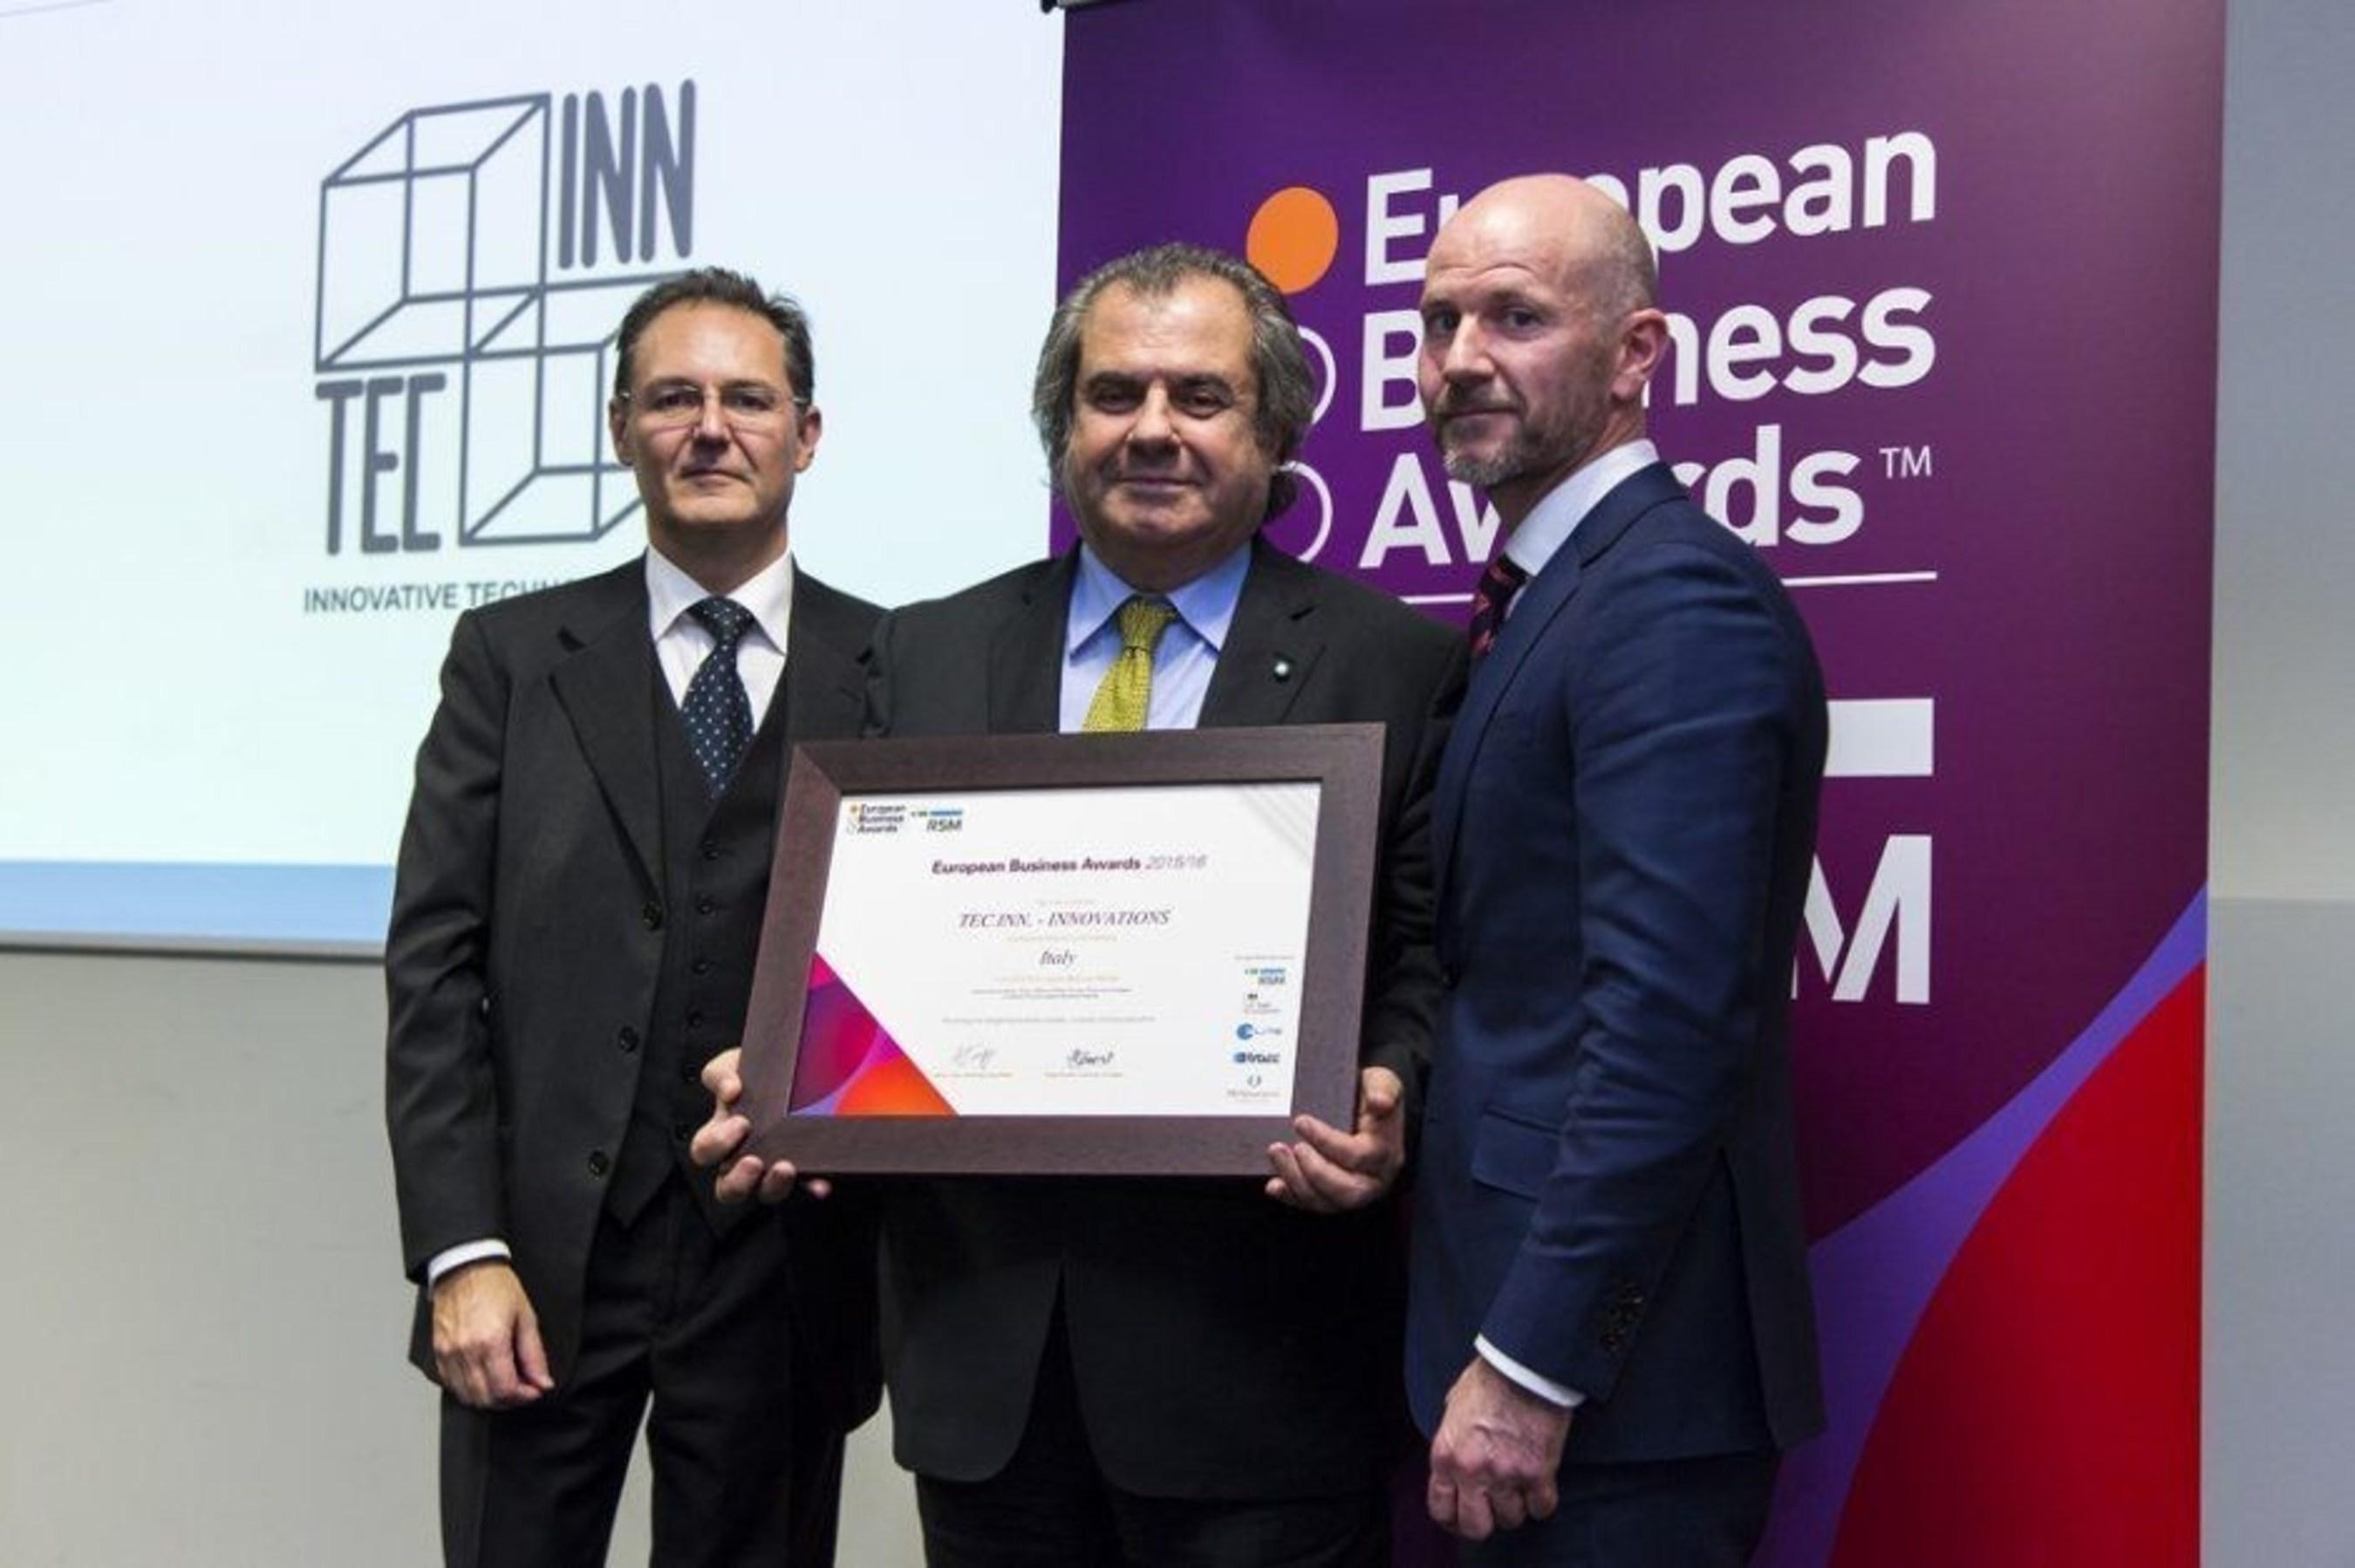 Milan, 27 November 2015, Eng. Emo Agneloni receives the Award as National Champions for Tec. Inn. INNOVATIONS (PRNewsFoto/TEC.INN. - INNOVATIONS) (PRNewsFoto/TEC.INN. - INNOVATIONS)